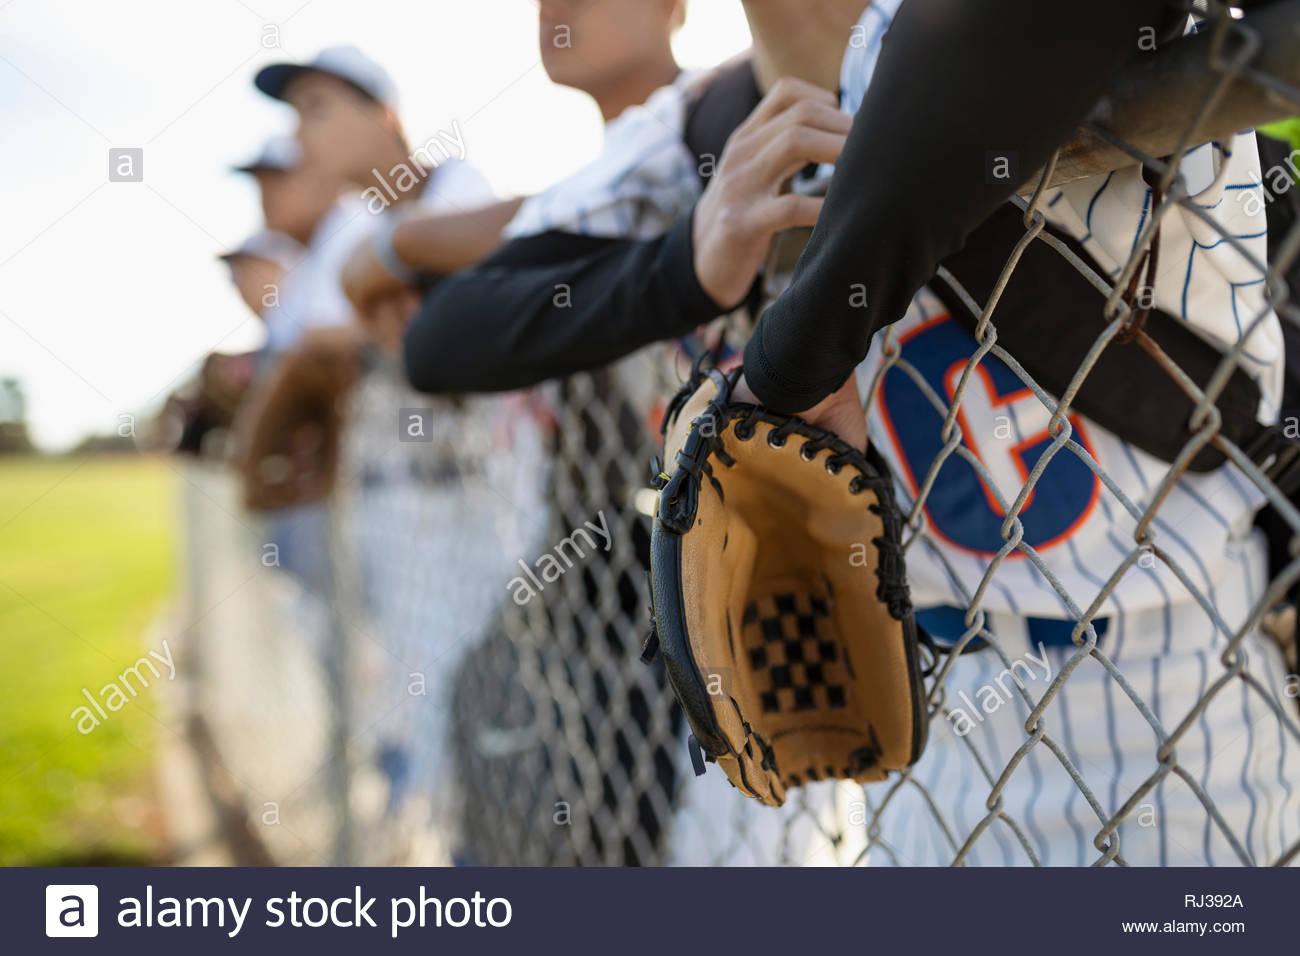 Les joueurs de baseball leaning on fence Photo Stock